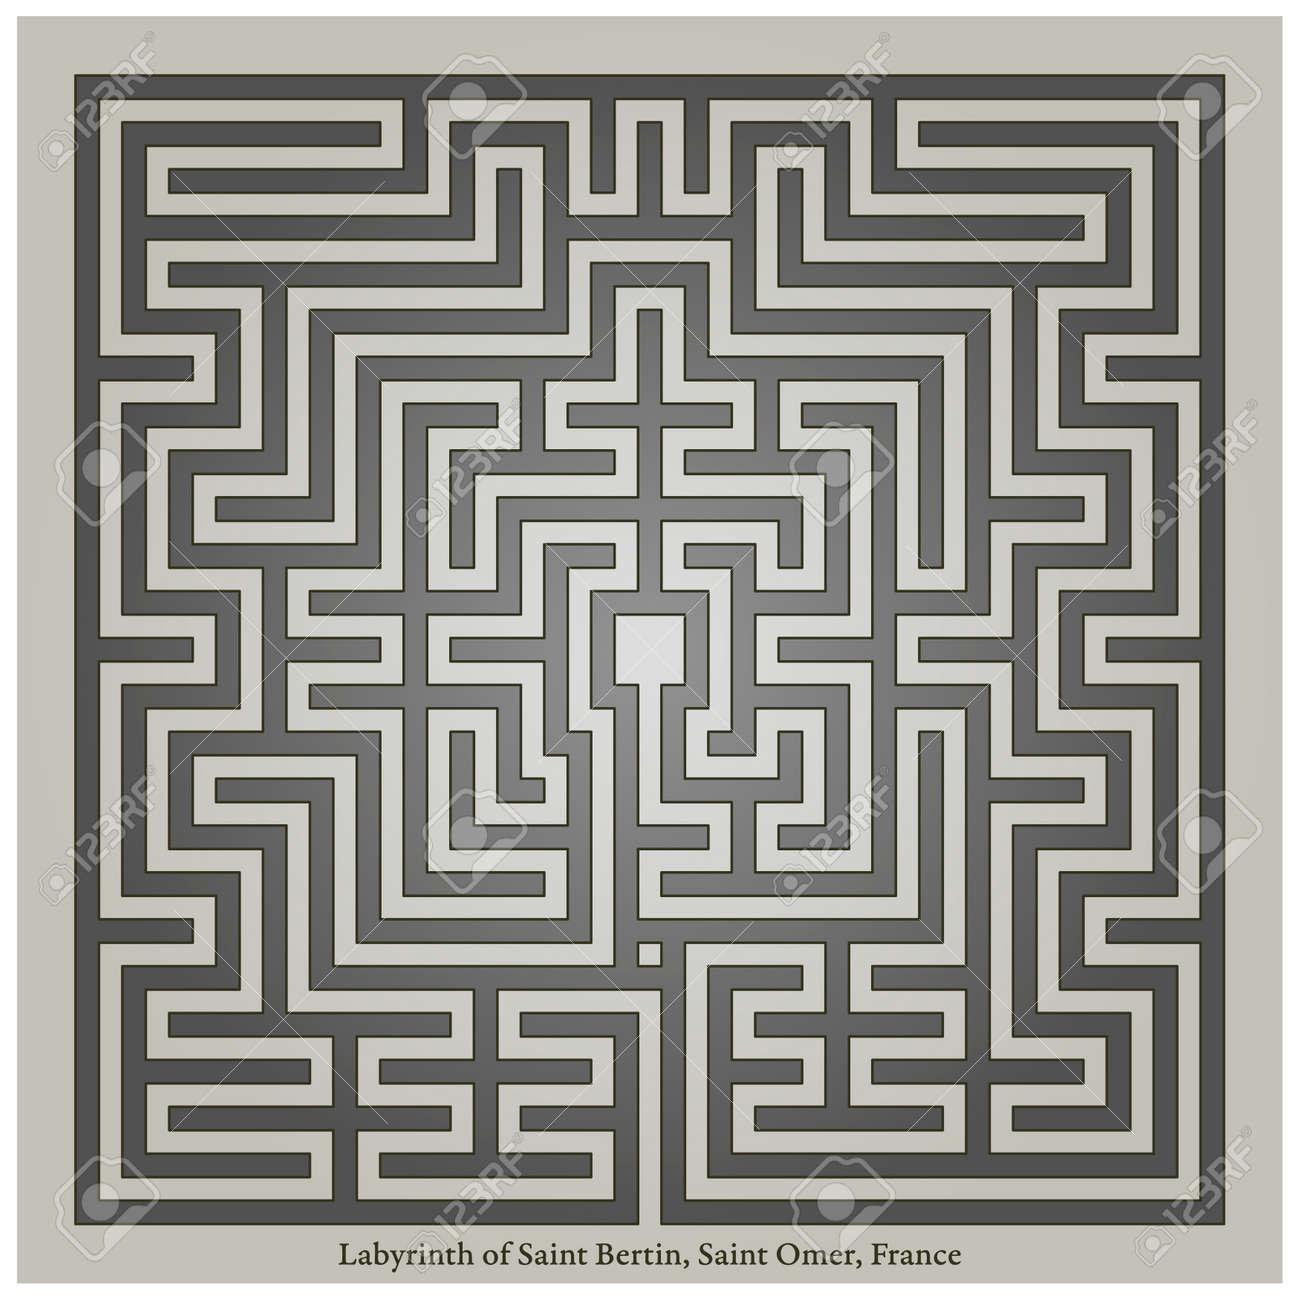 Labyrinth of Saint Bertin, Saint Omer, France, vector illustration - 173043038